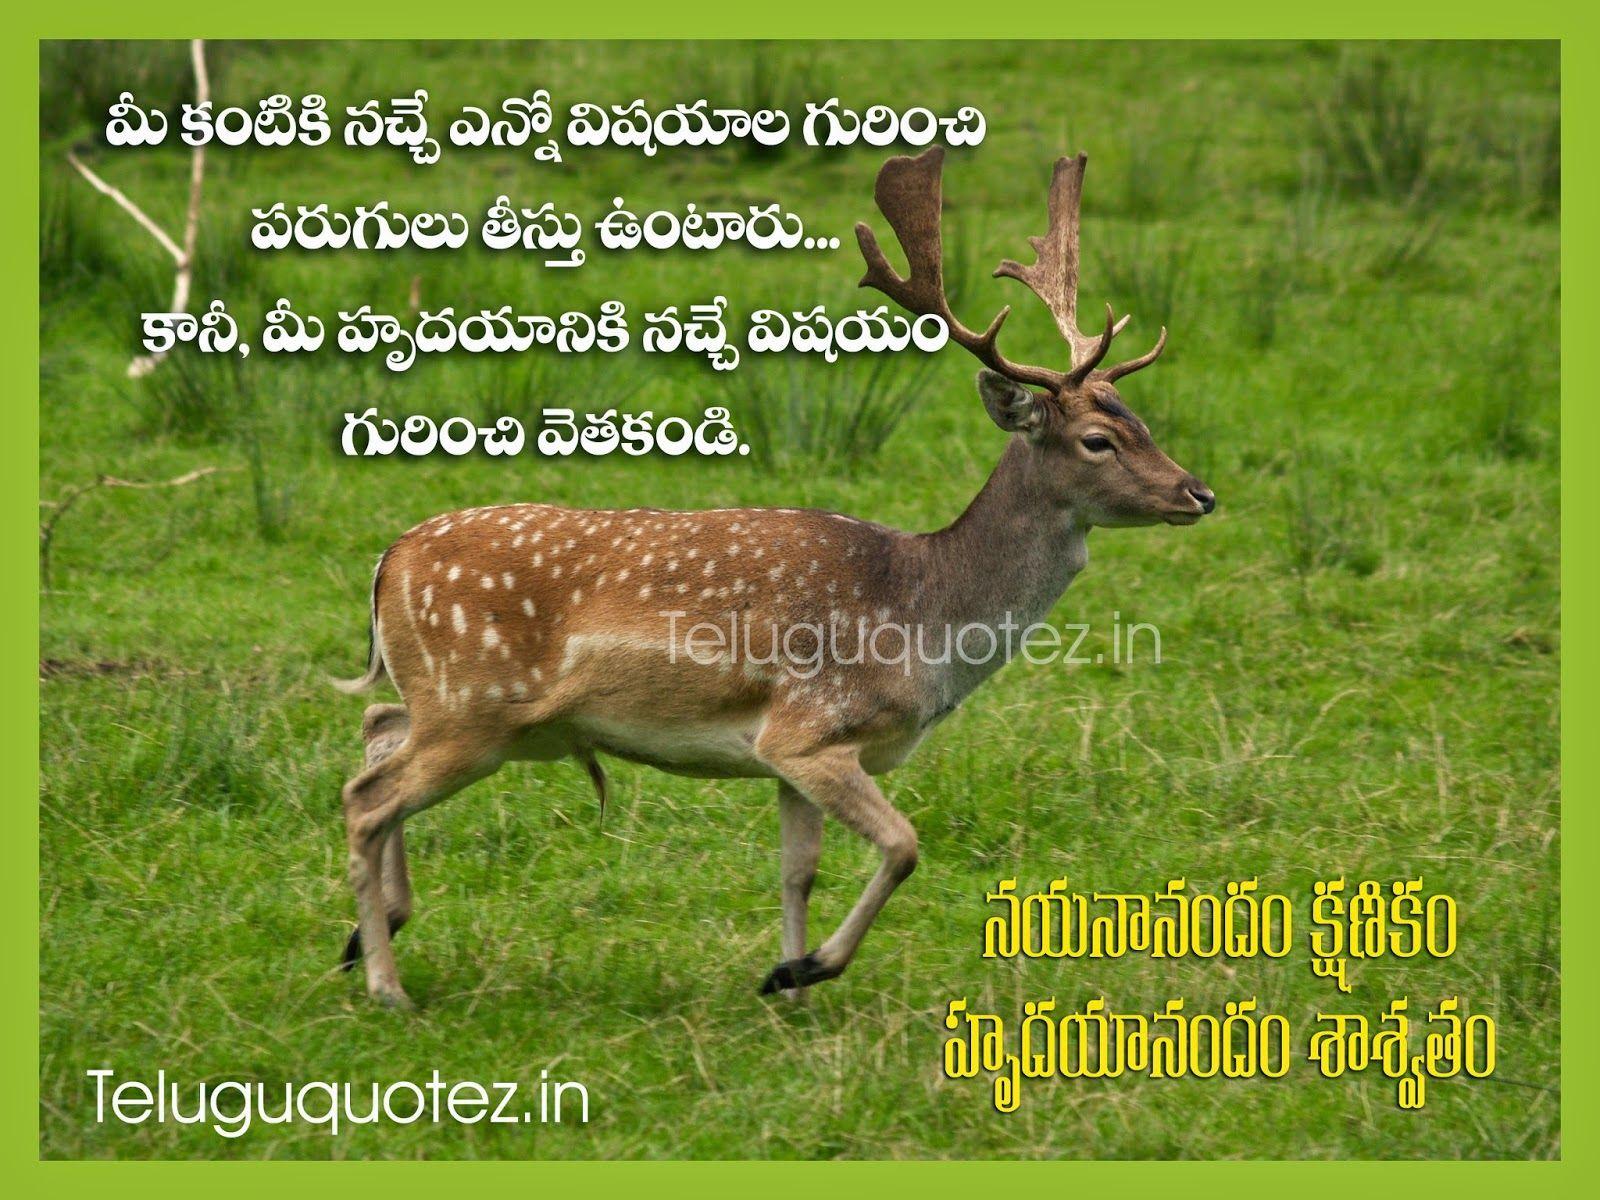 Teluguquotezin Positive Life Quotes In Telugu Language Telugu